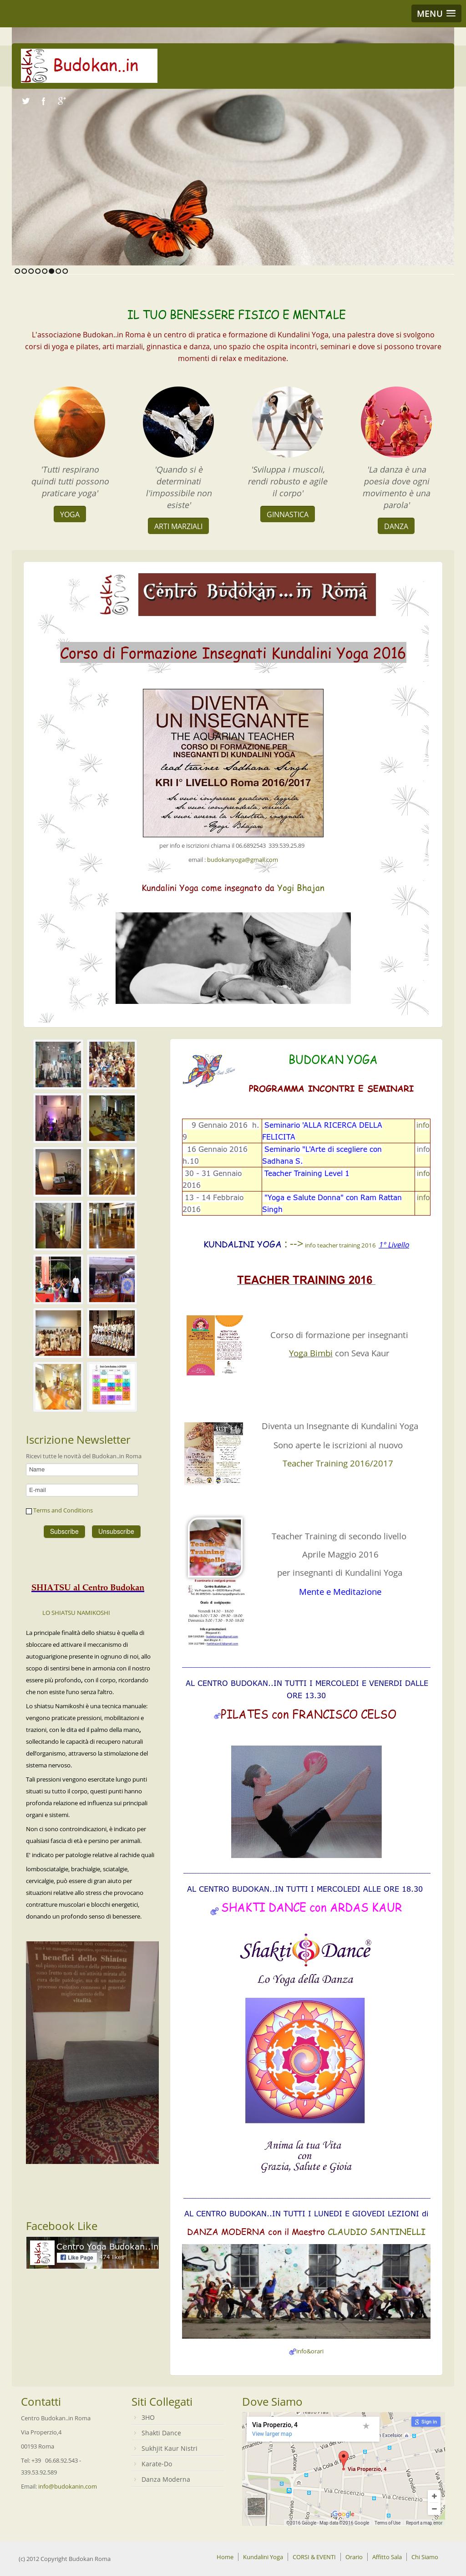 Ram Rattan Singh Roma.Centro Yoga Budokan In Roma Competitors Revenue And Employees